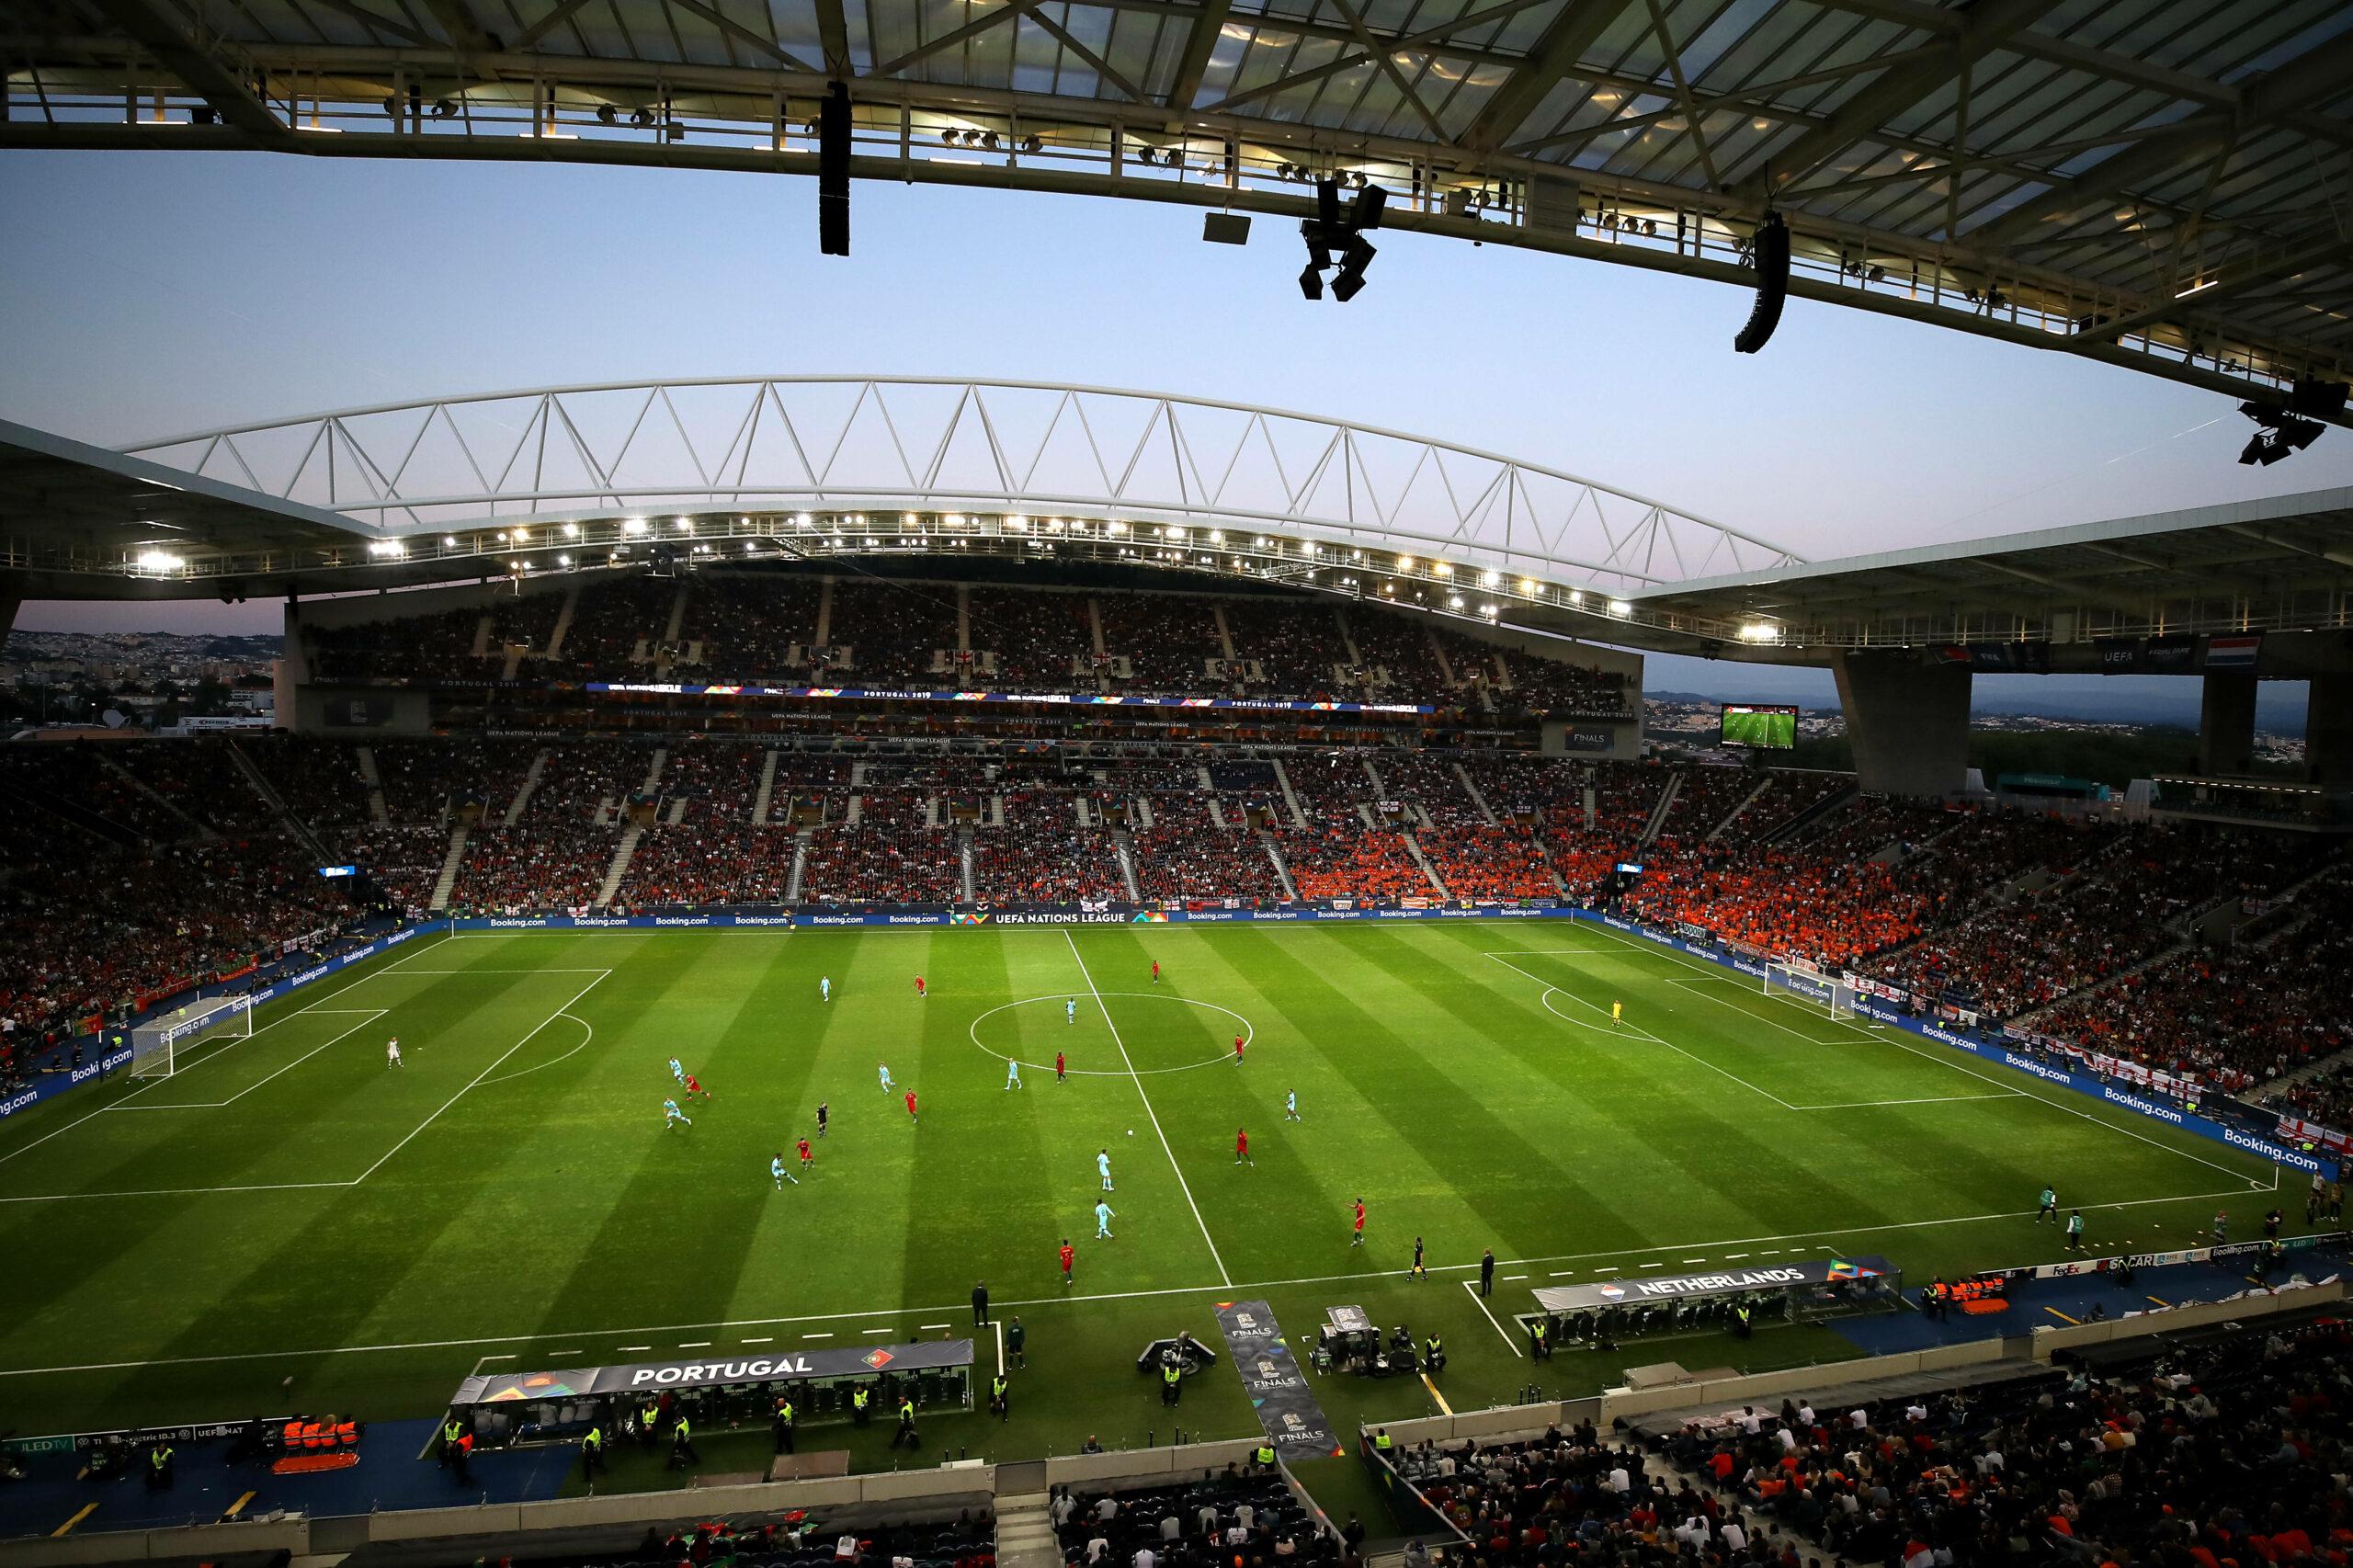 Das Estadio do Dragao in Porto